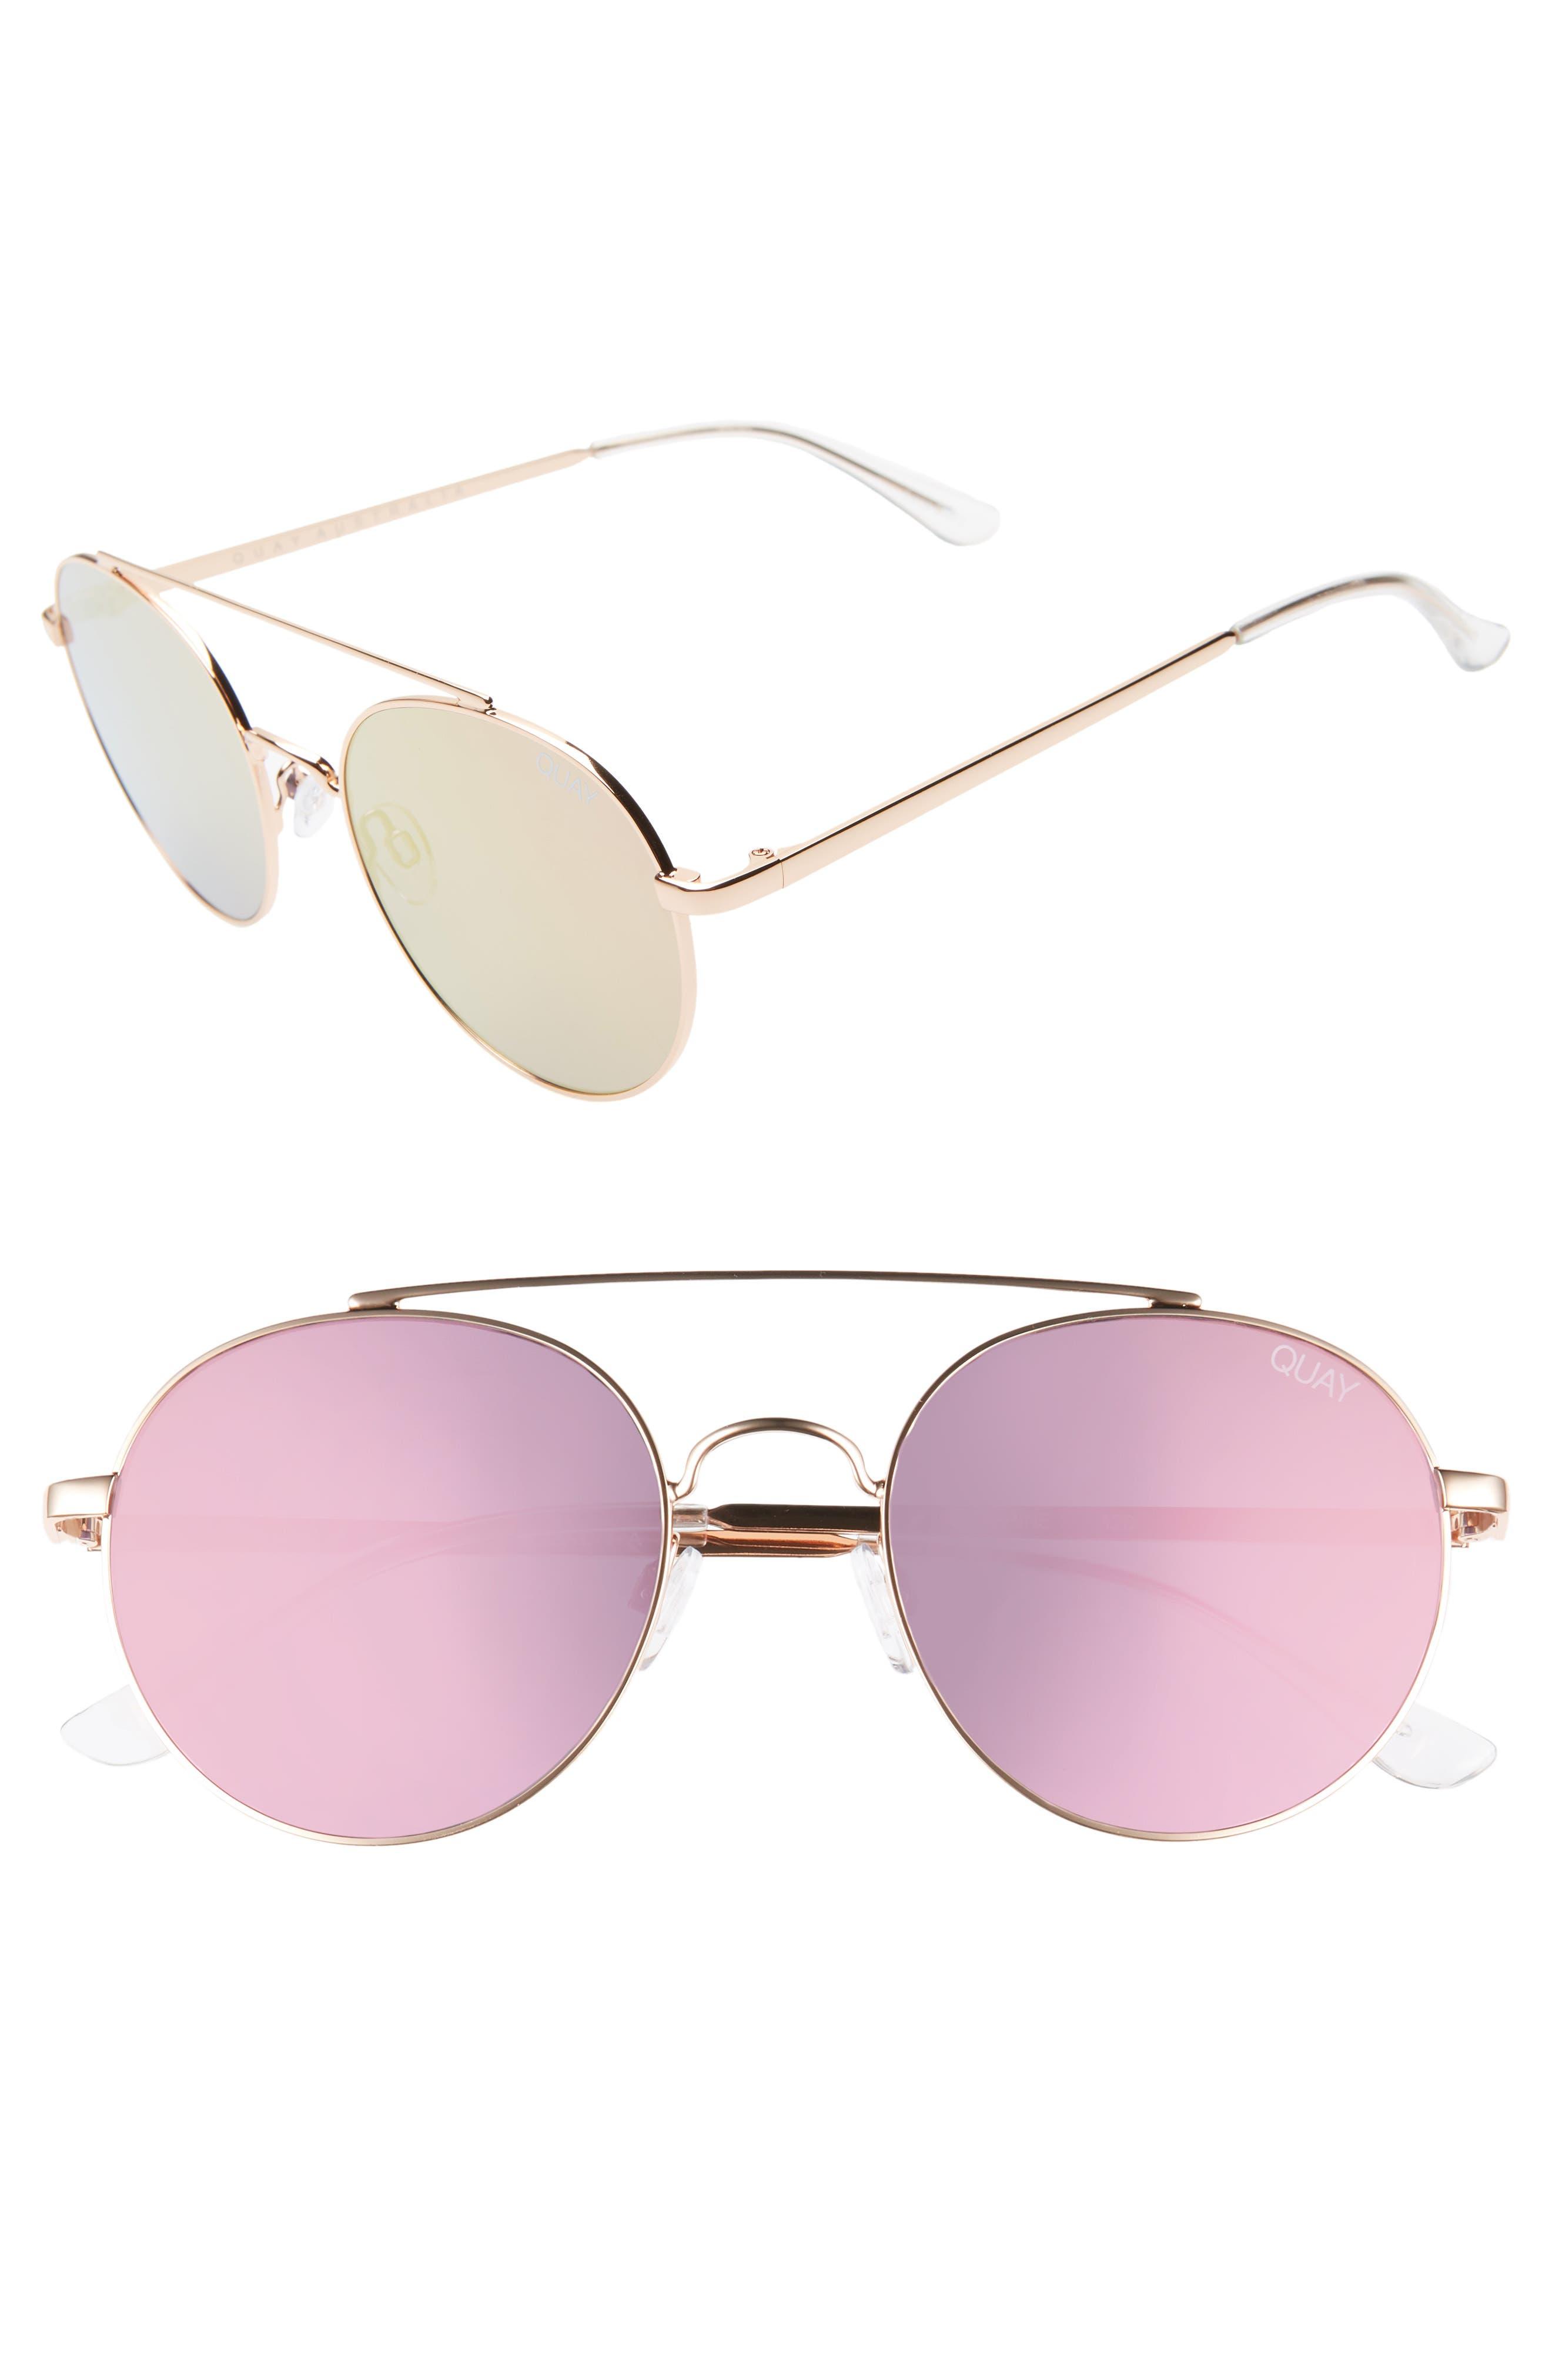 Quay Australia Outshine 5m Round Sunglasses - Rose / Pink